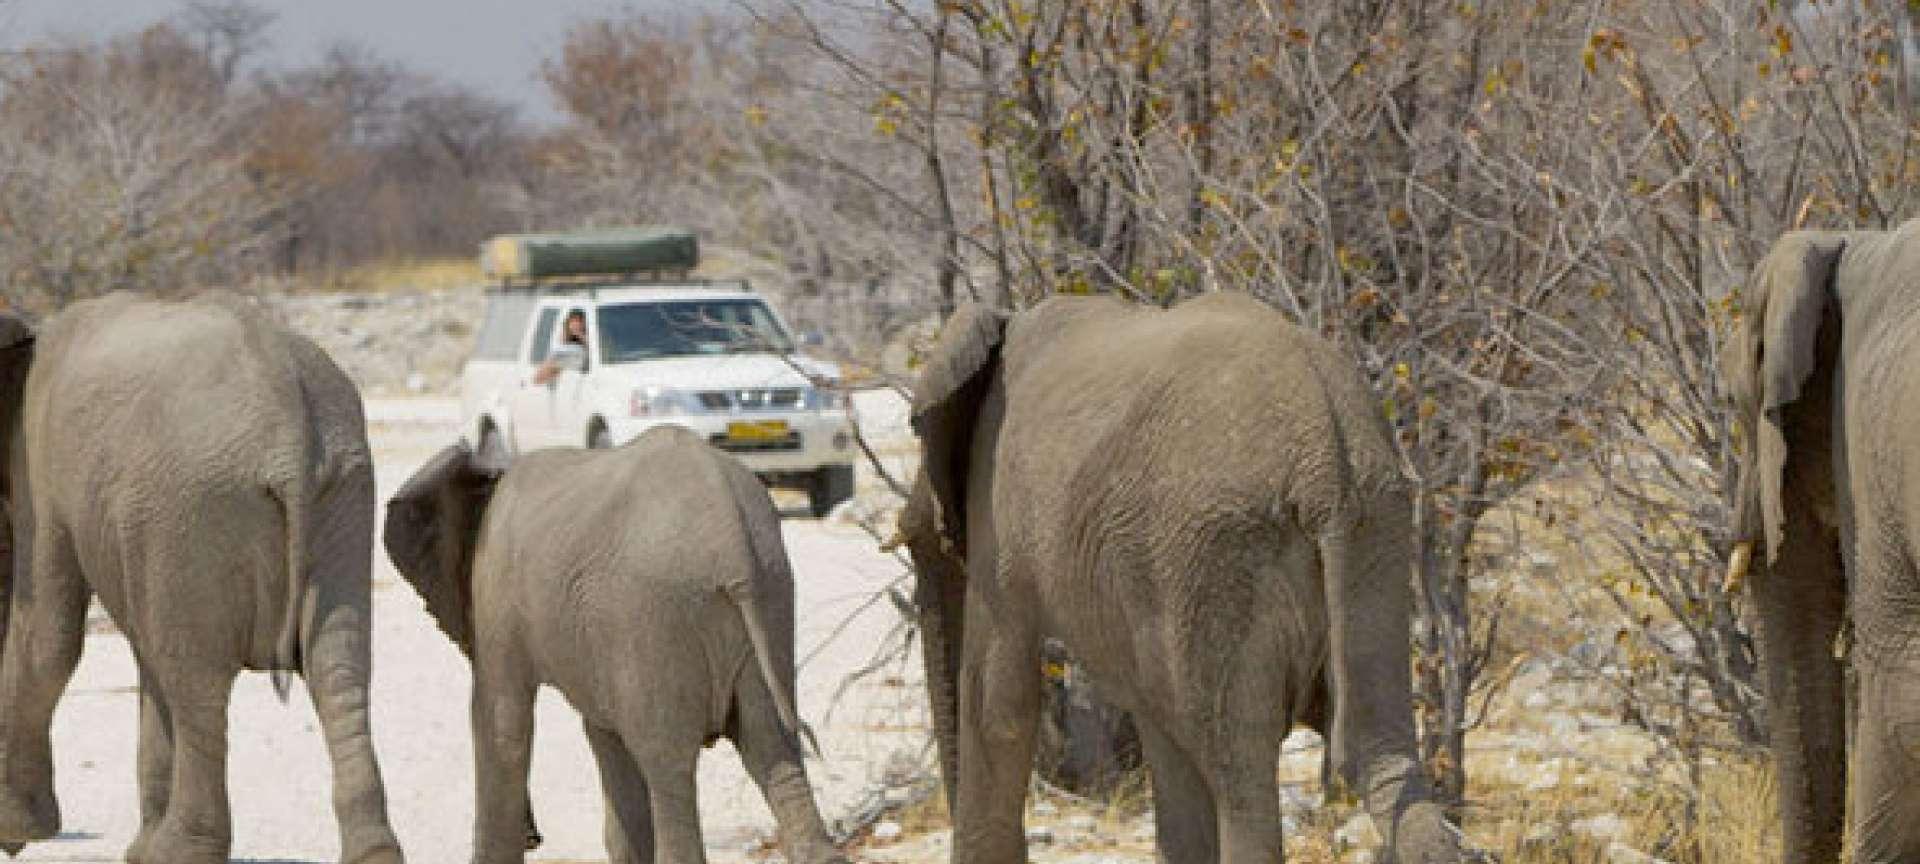 Best of Namibia, Botswana & Victoria Falls Guided Self-Drive Safari